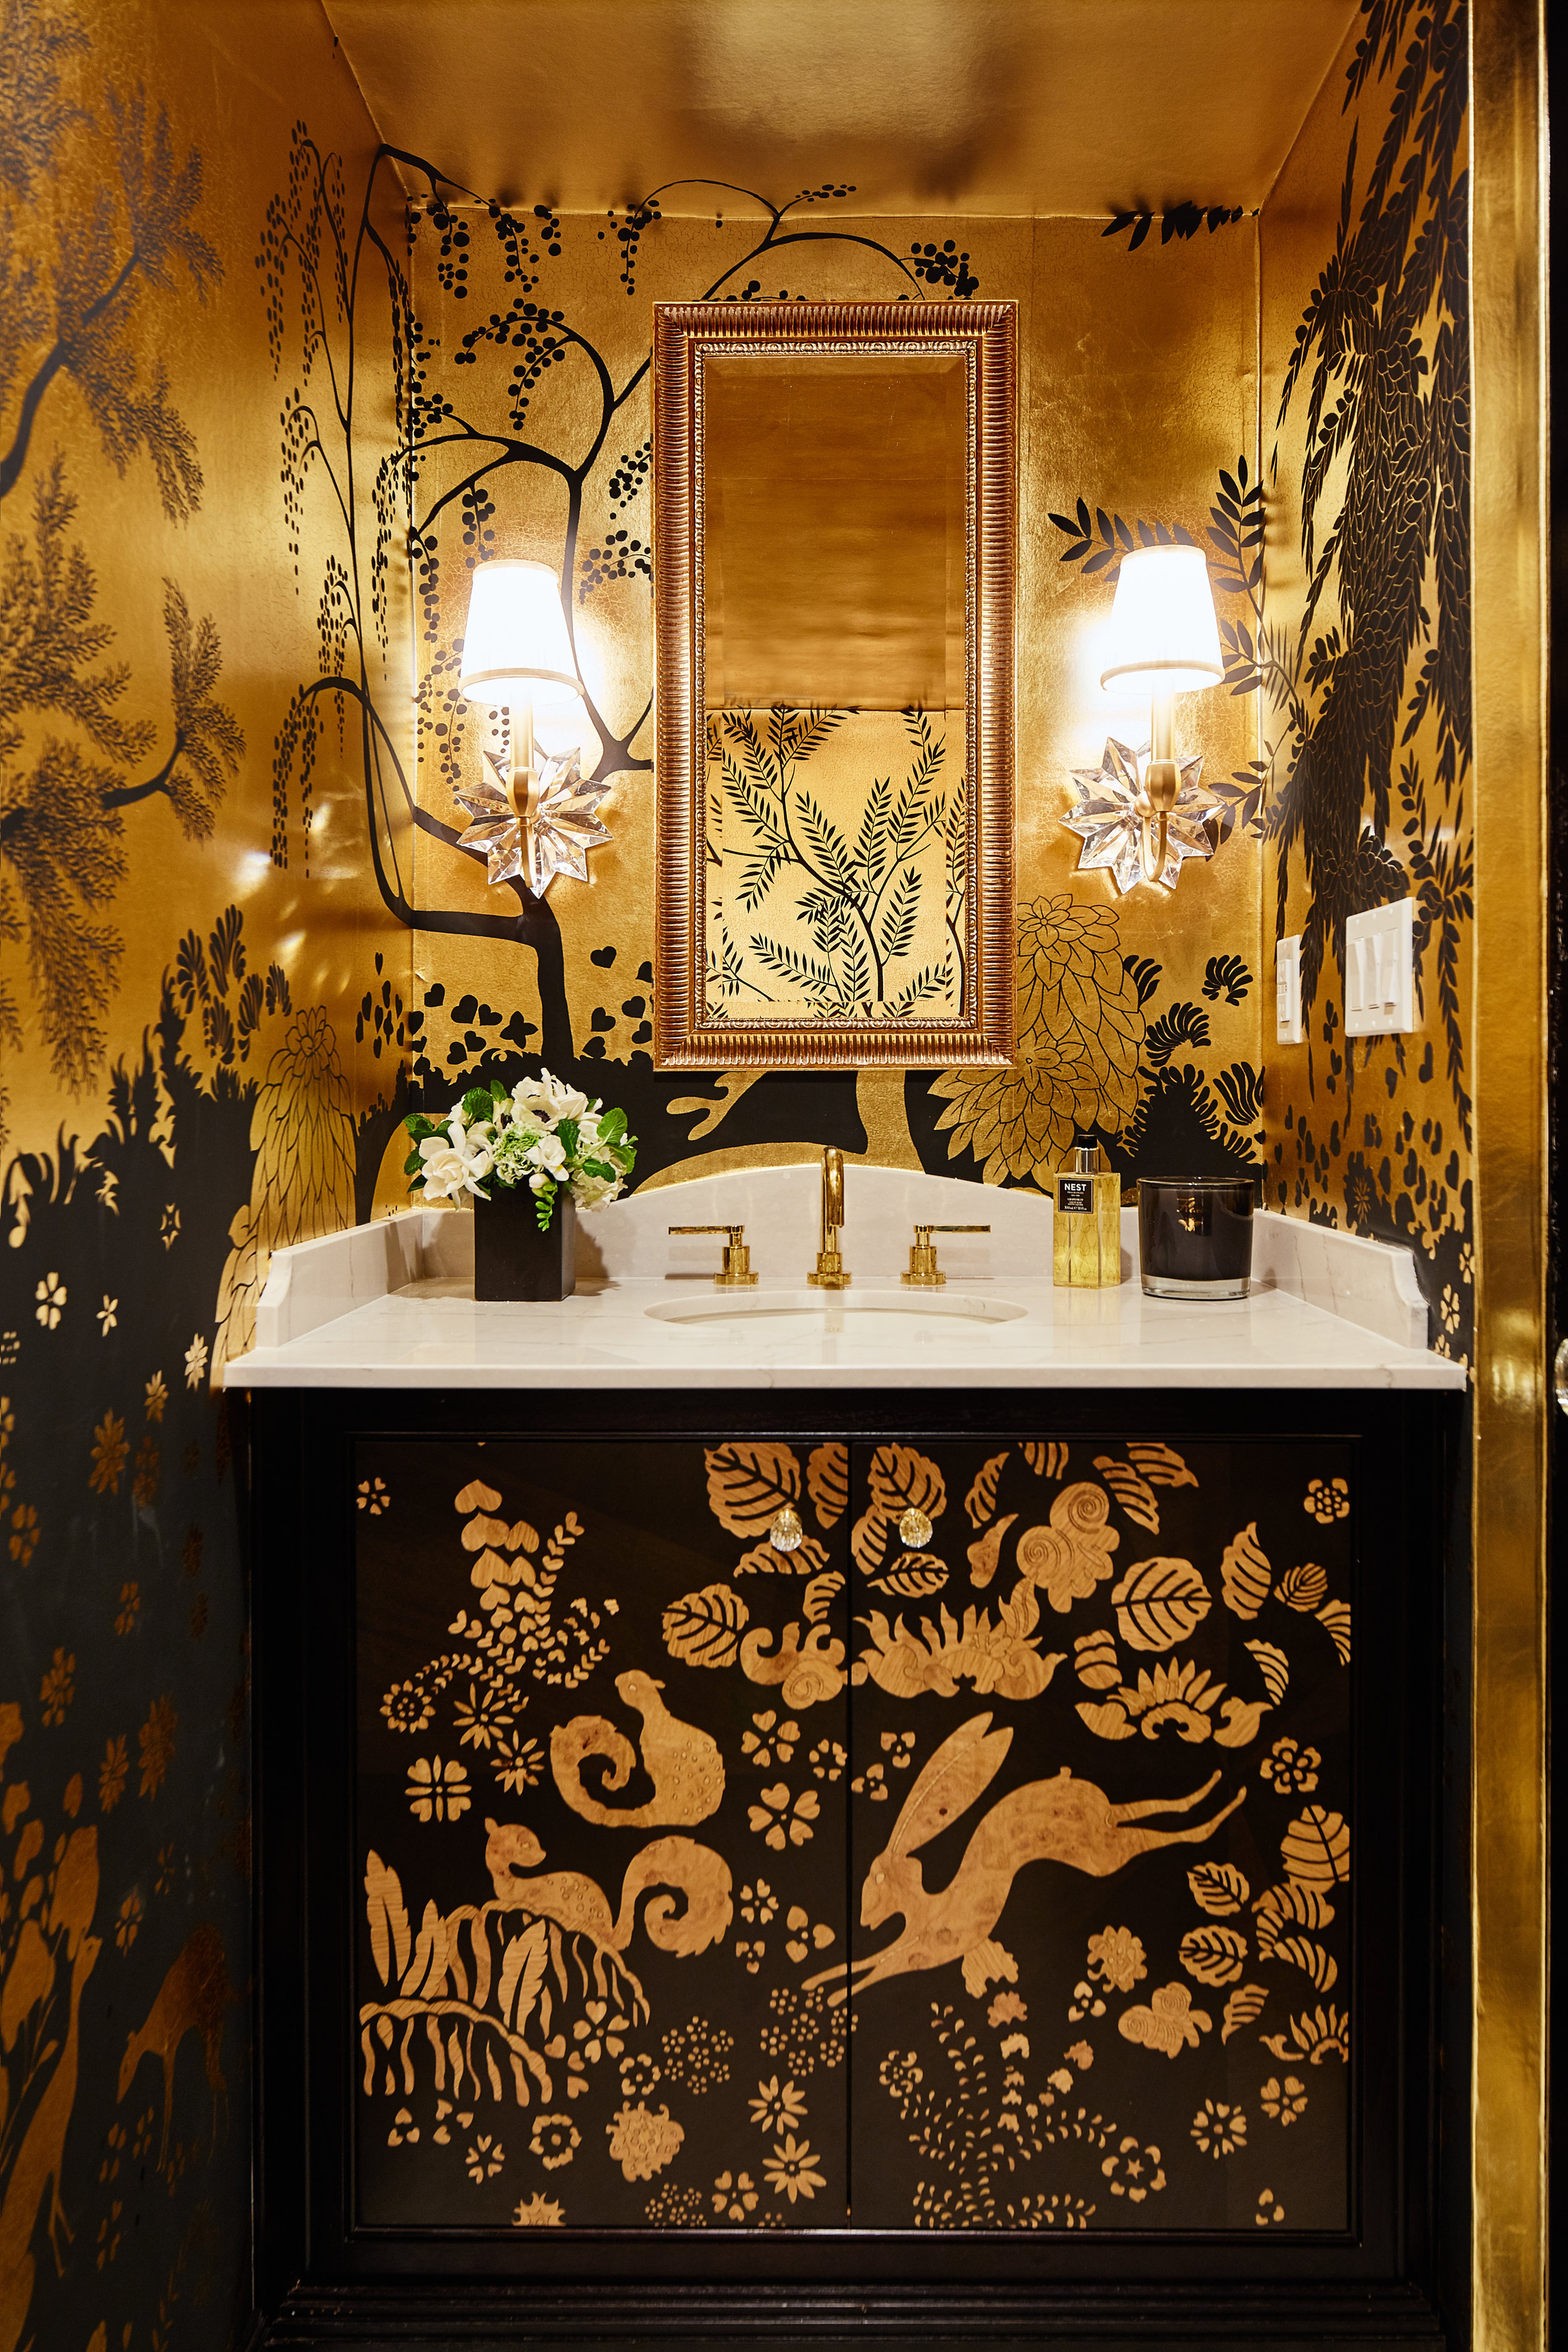 """Rateau"" - the ""Sexiest"" Bathroom"